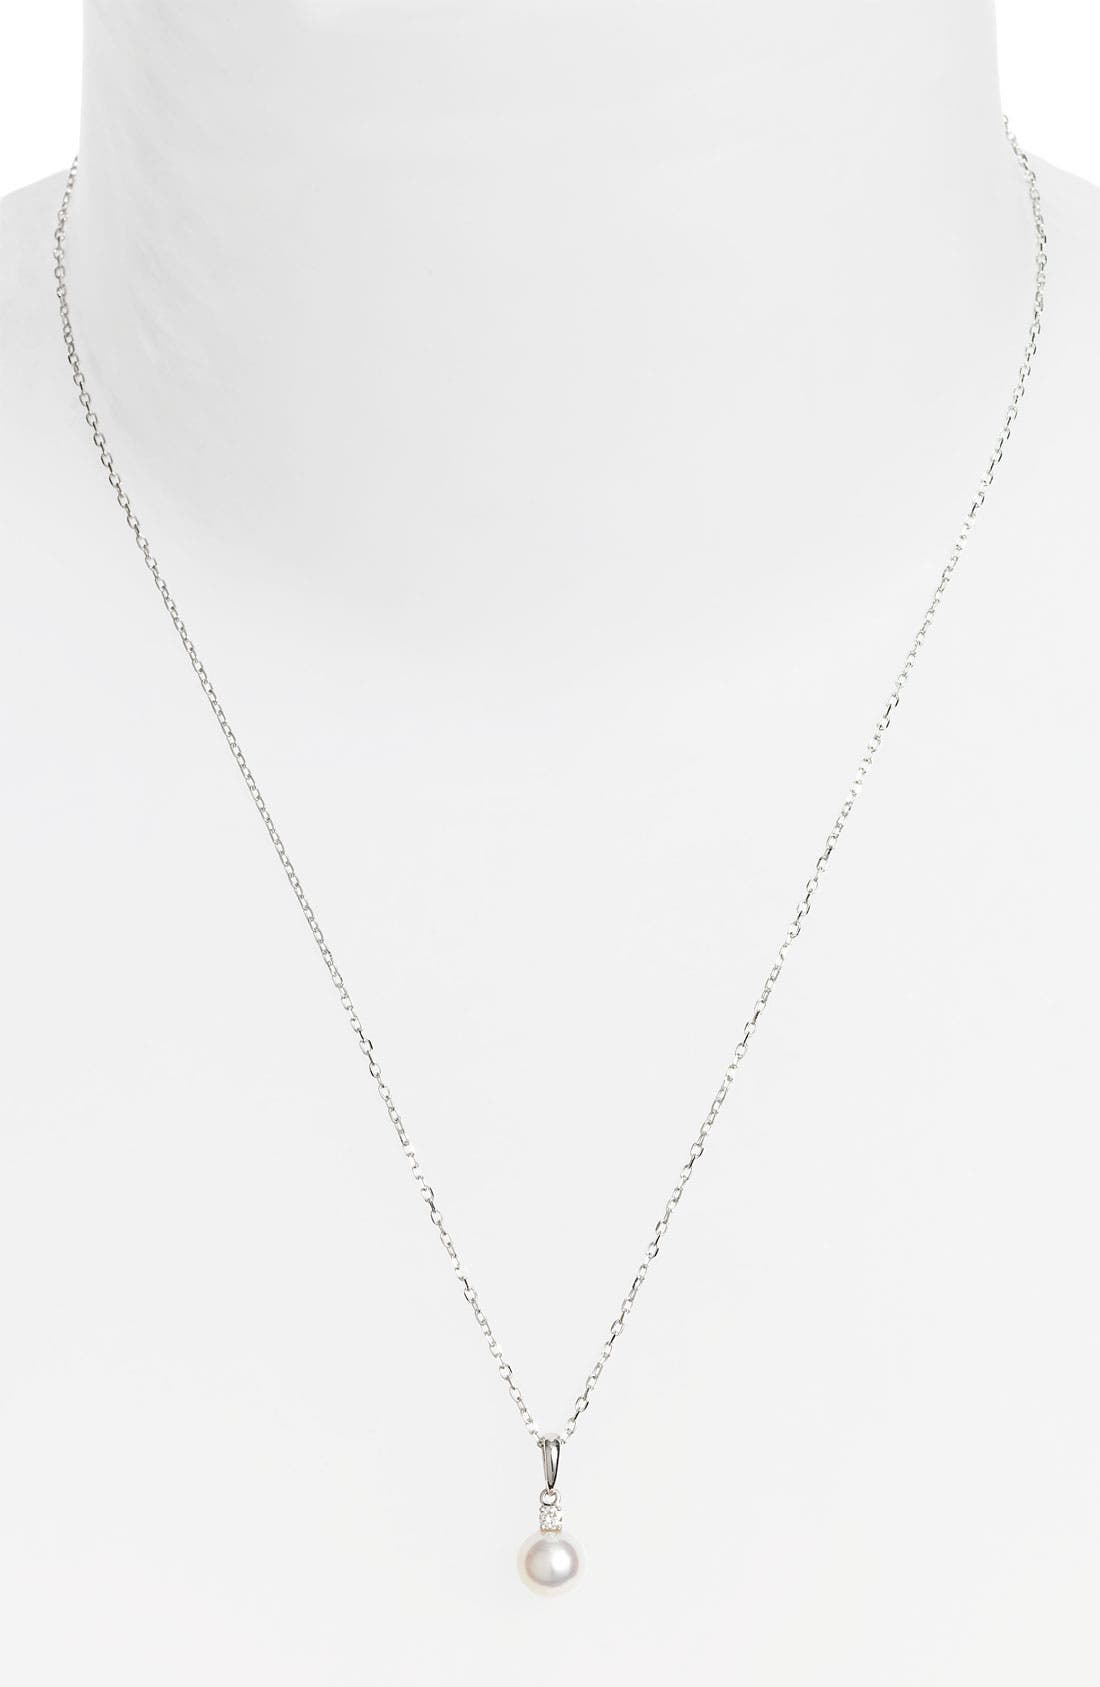 Alternate Image 1 Selected - Mikimoto Diamond & Akoya Cultured Pearl Pendant Necklace